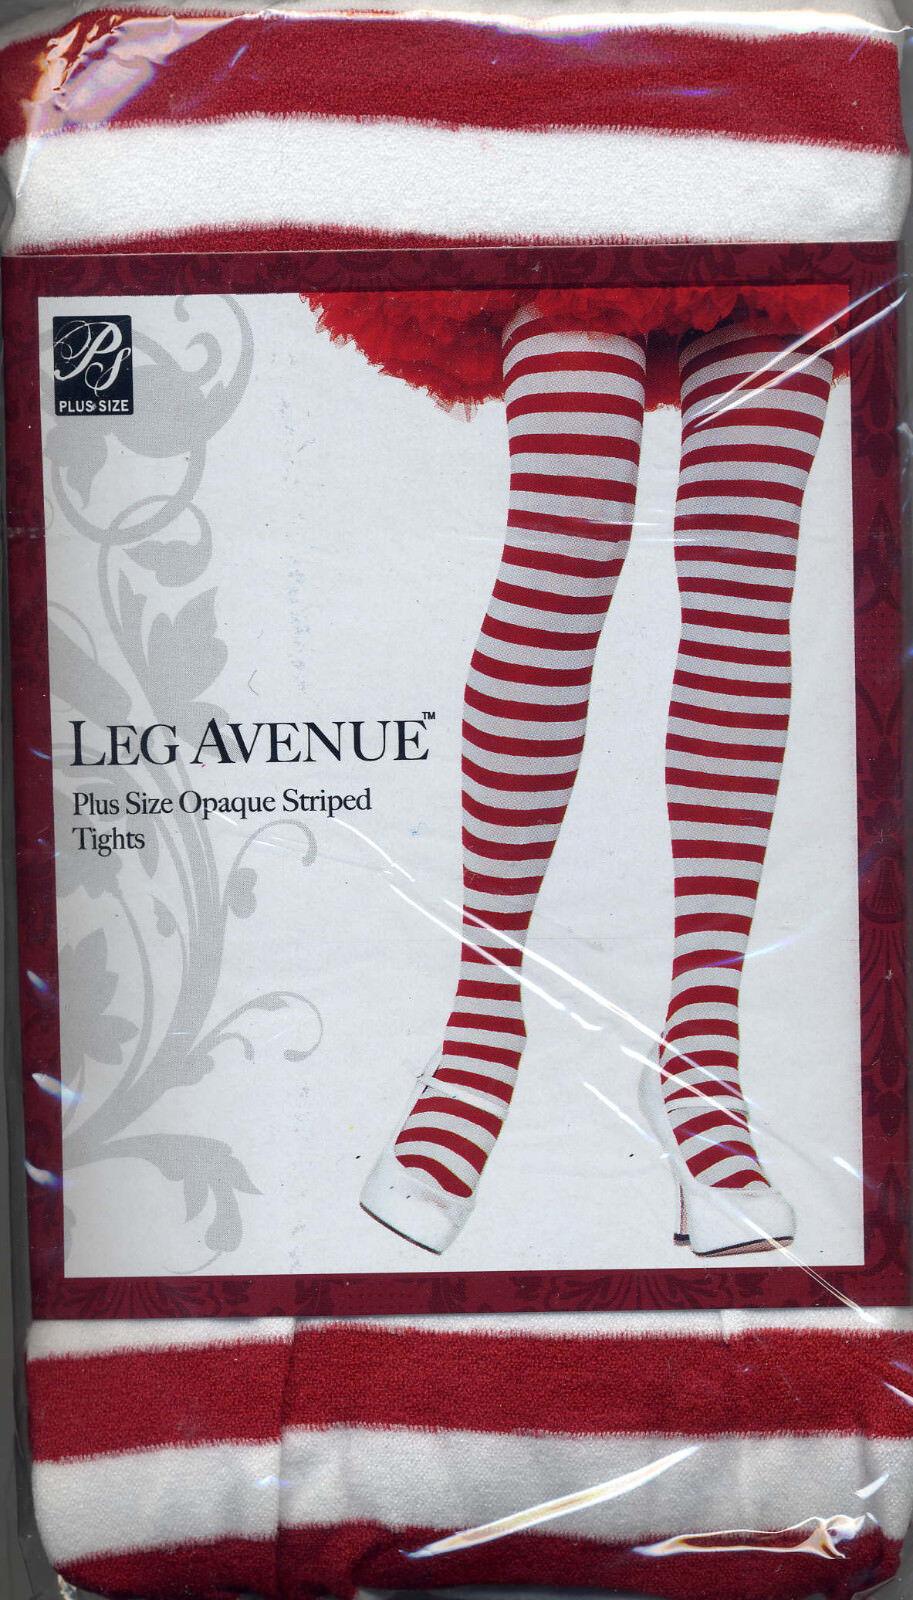 3869d982a ... Leg Avenue 7100 Women s Opaque Striped Tights Plus 1-2X or 3-4X Queen